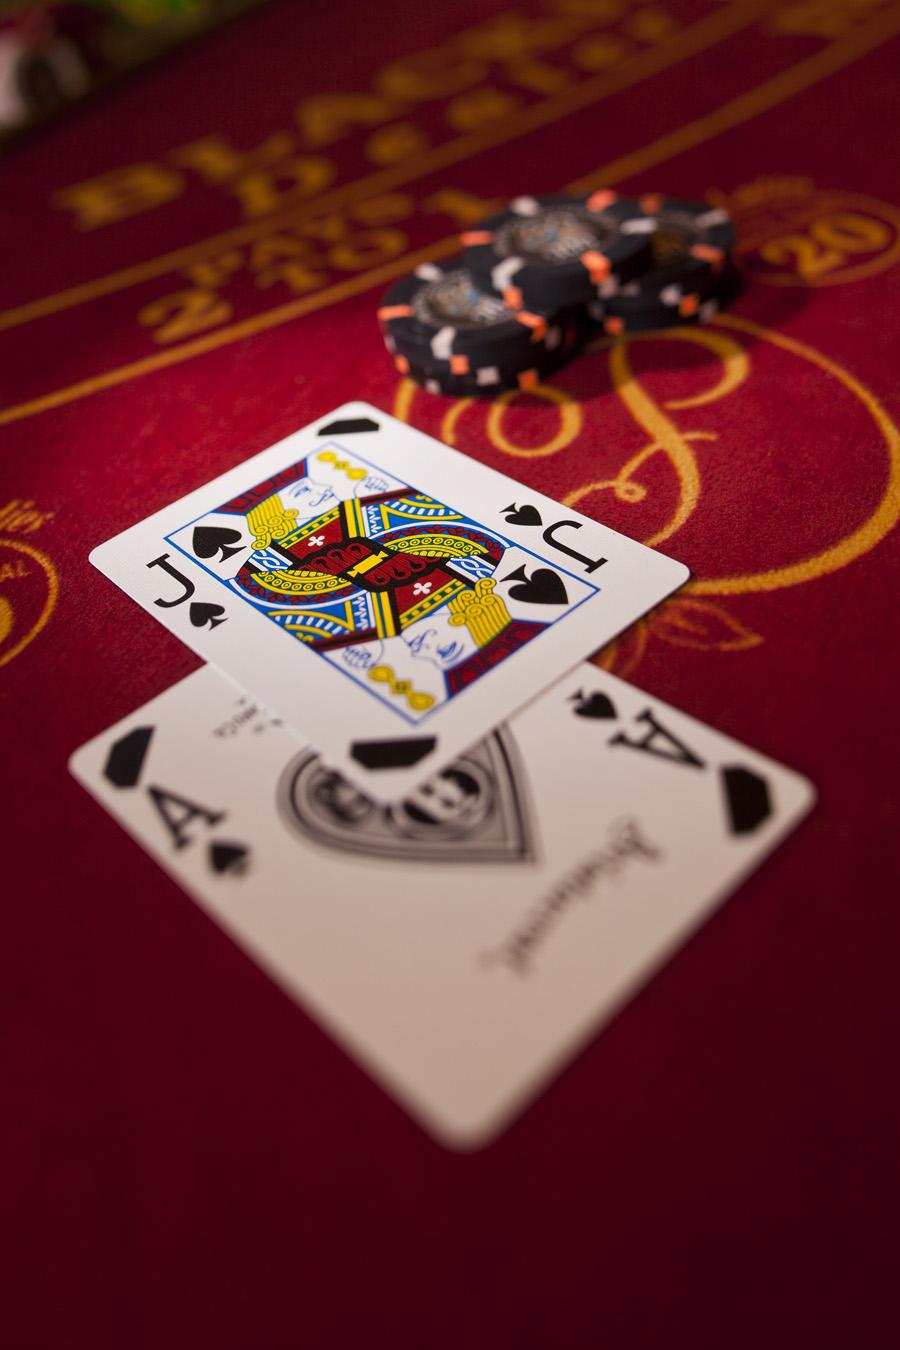 imagescasino-blackjack-7.jpg